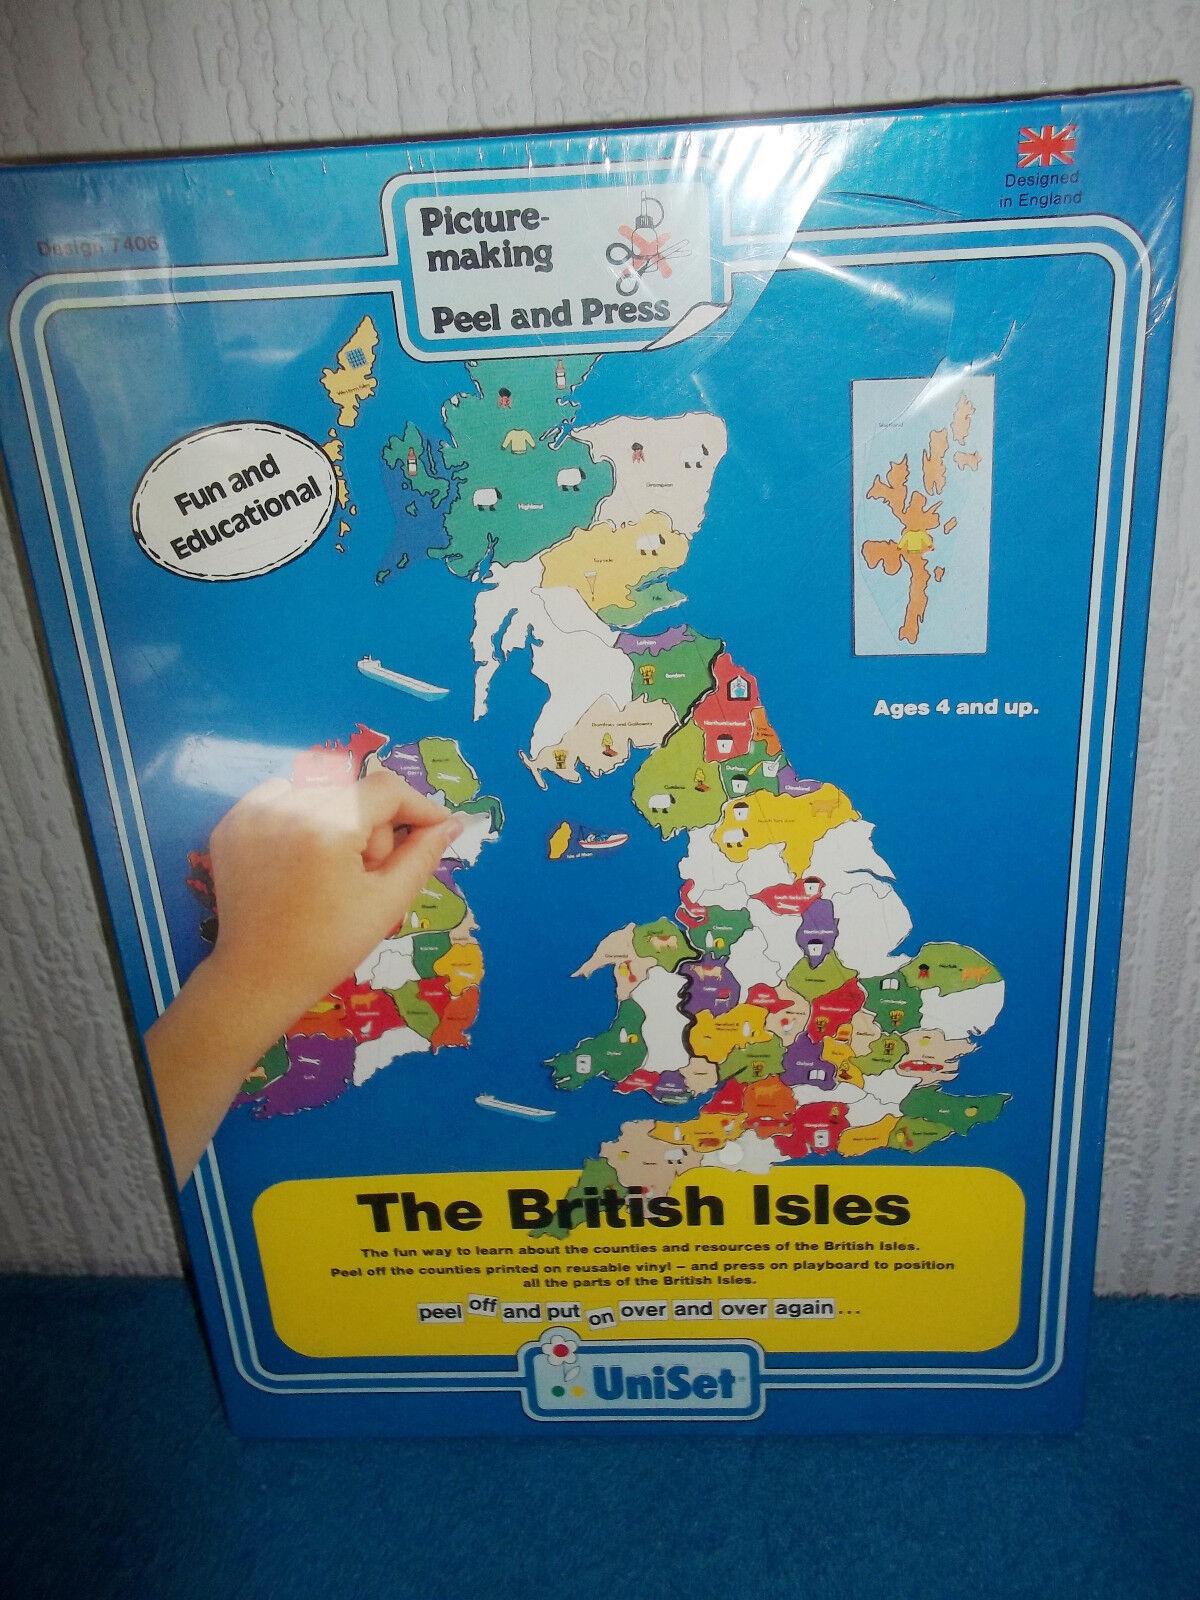 THE BRITISH ISLES - UNISET PICTURE-MAKING KIT - PRESS & PEEL VINYL - NEW SEALED